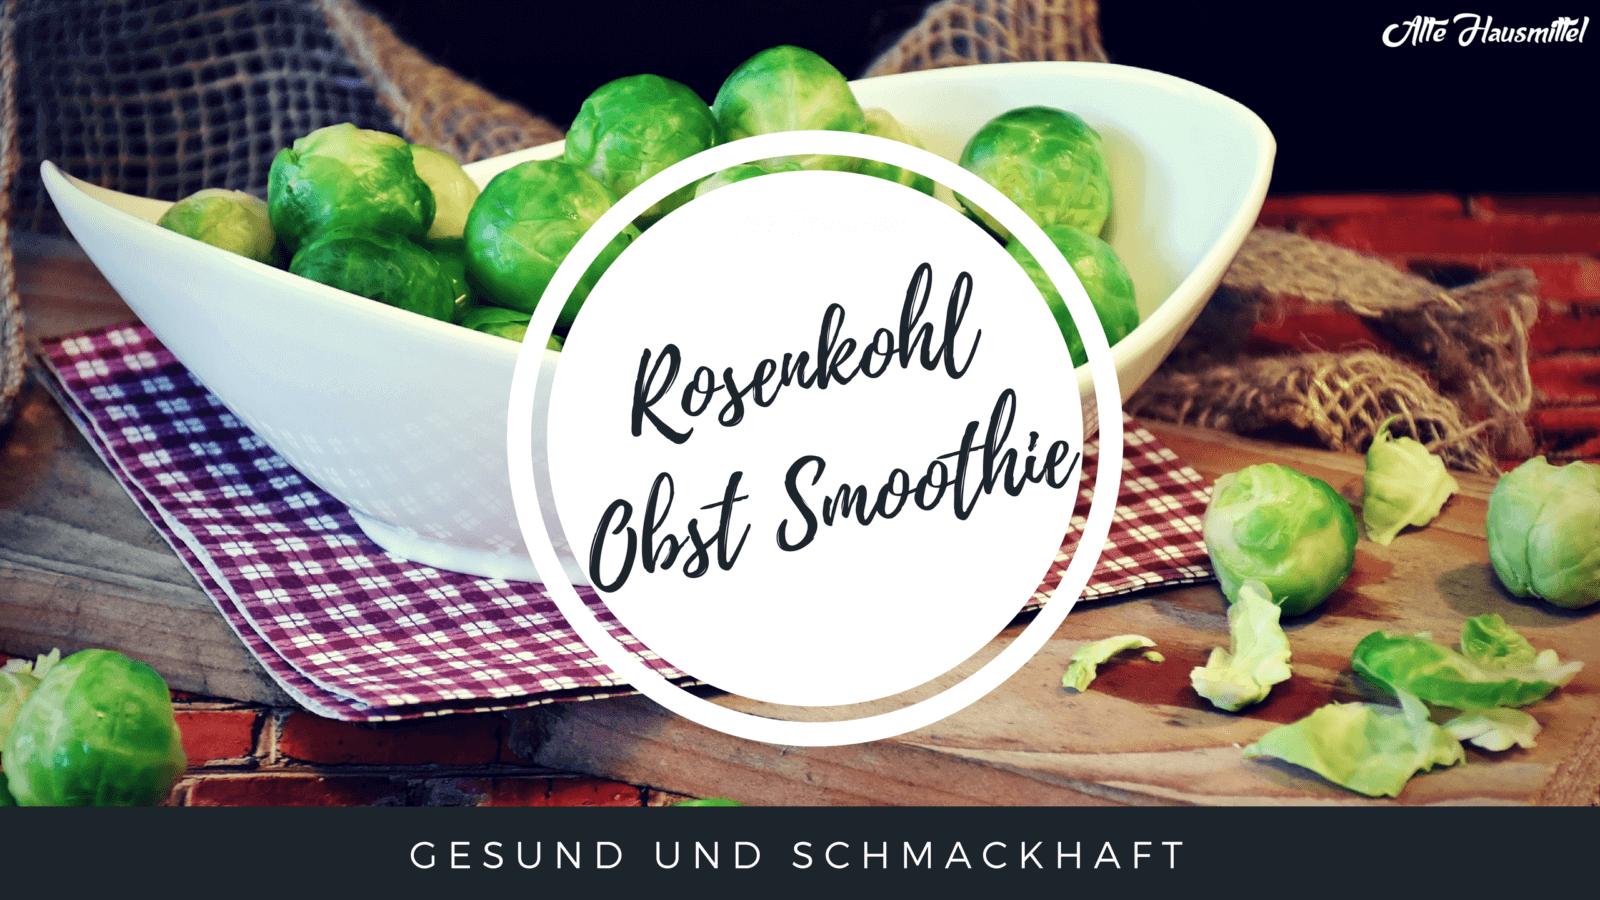 Rosenkohl Obst Smoothie